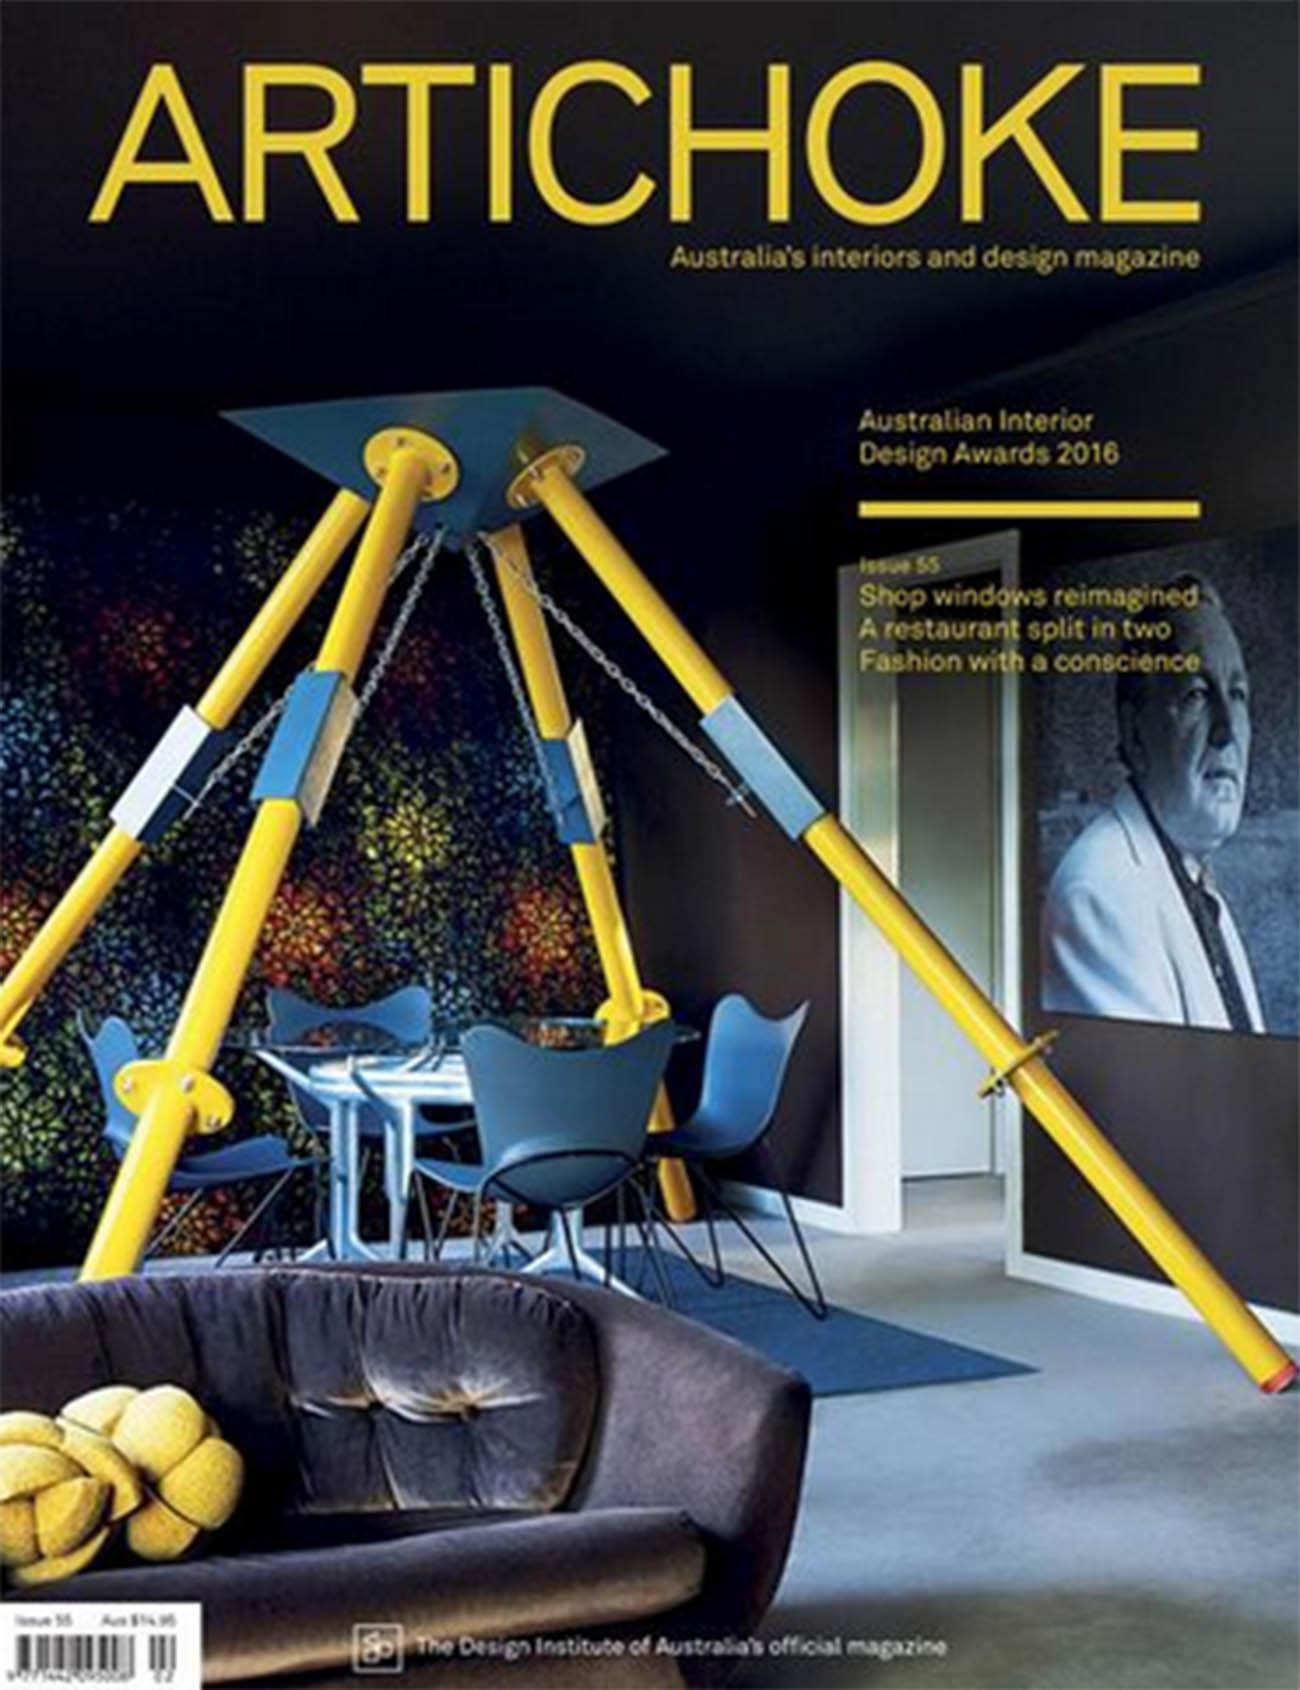 Artichoke – Fred Sydney